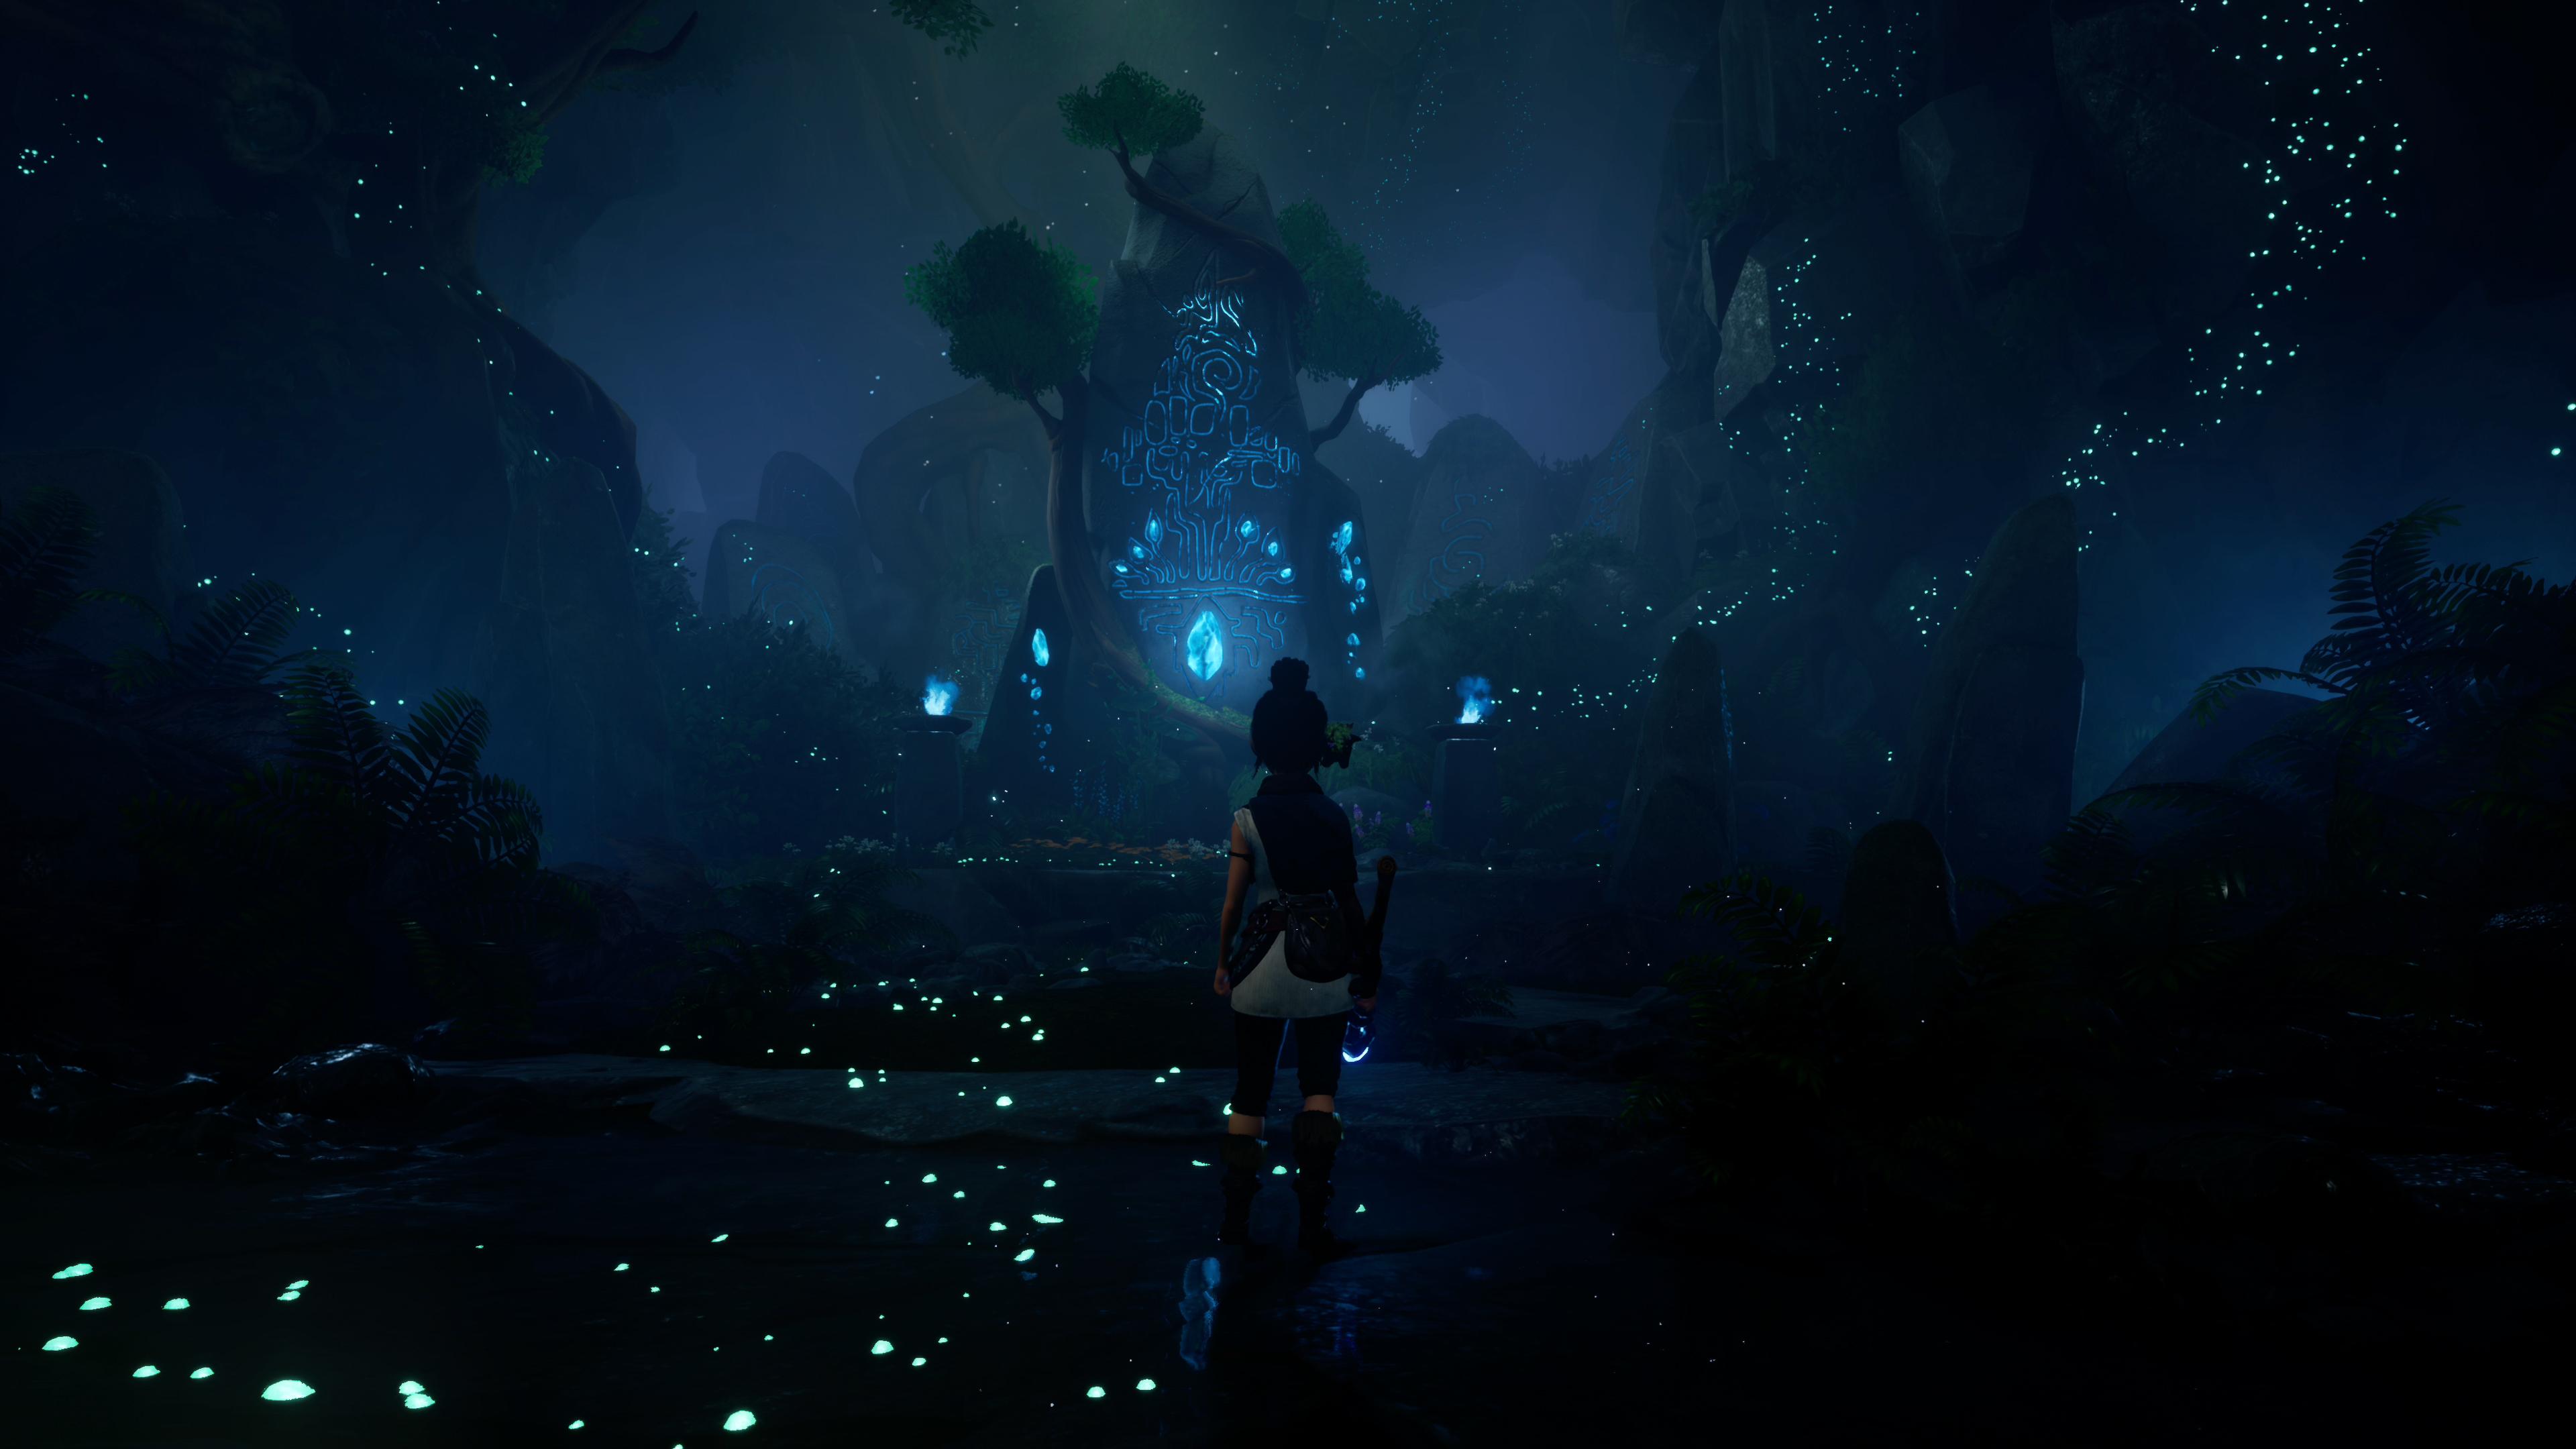 Скриншот №1 к Kena Bridge of Spirits Digital Deluxe PS4 and PS5